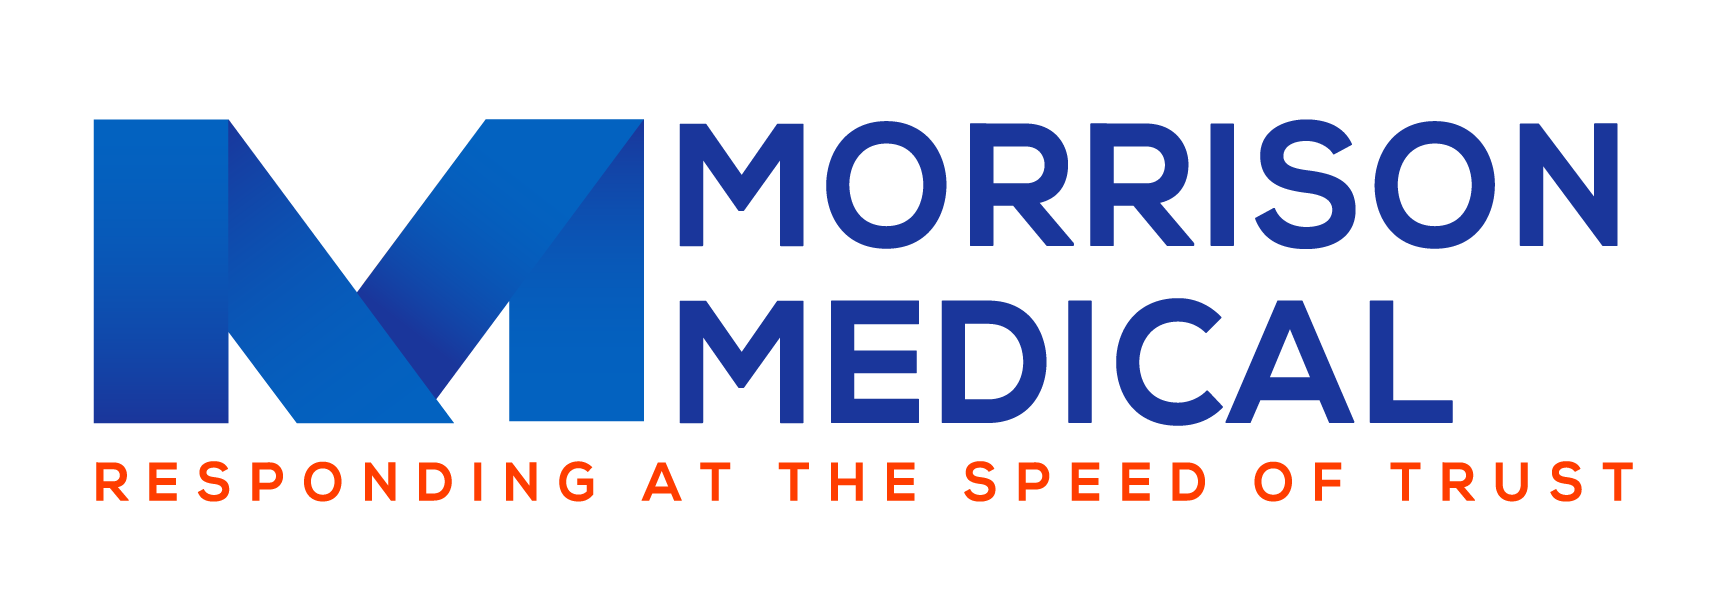 morrisonmedical Logo